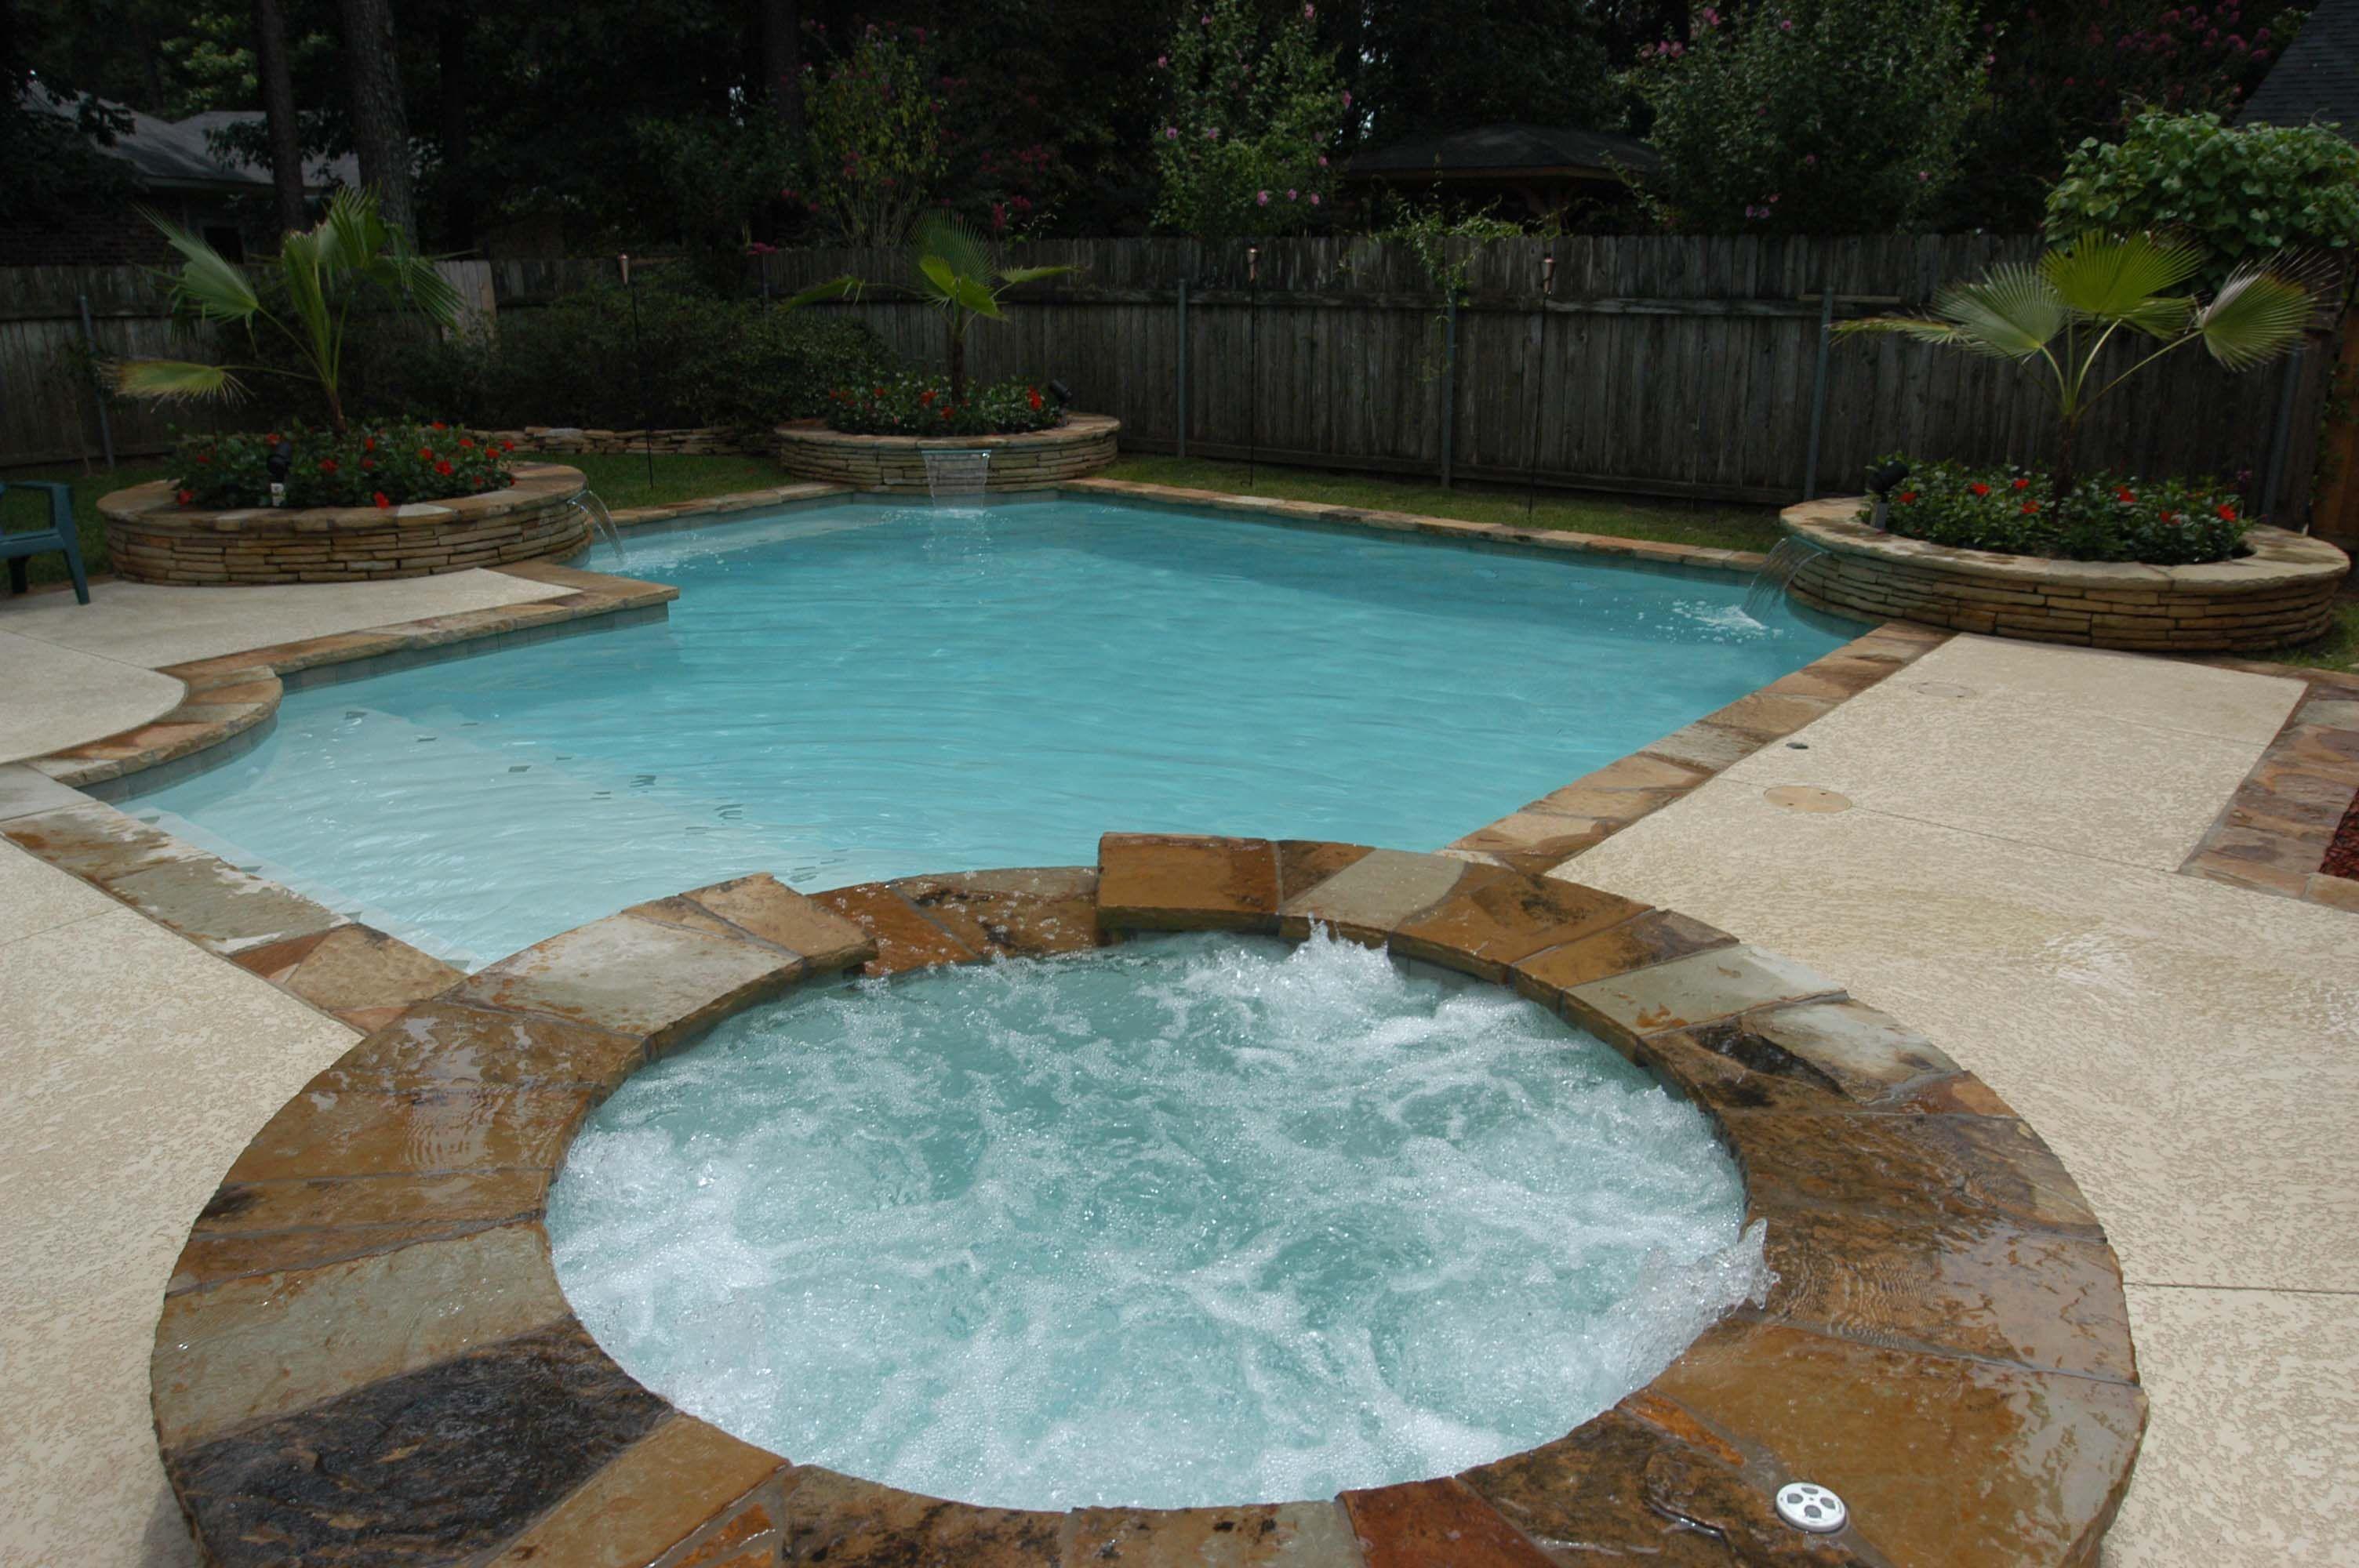 bossier city pool design shreveport pool construction classic